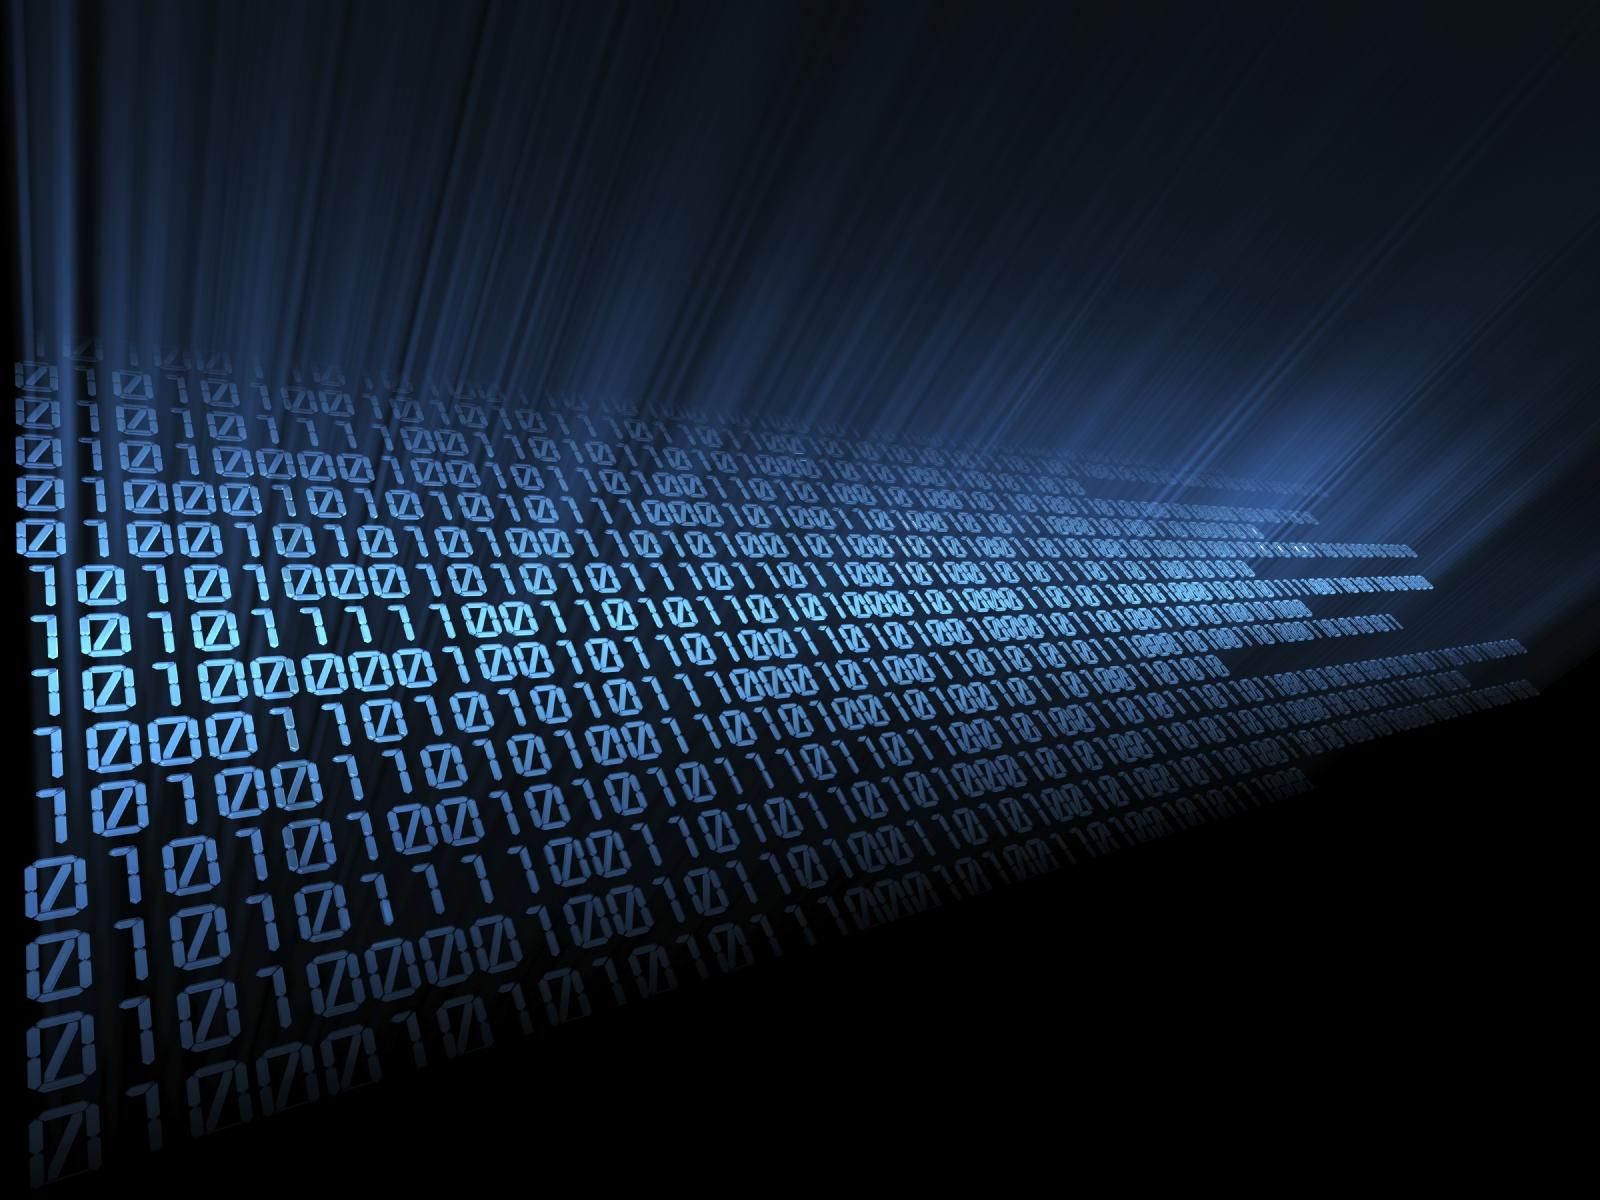 Eshcol Data Protection 1600x1200